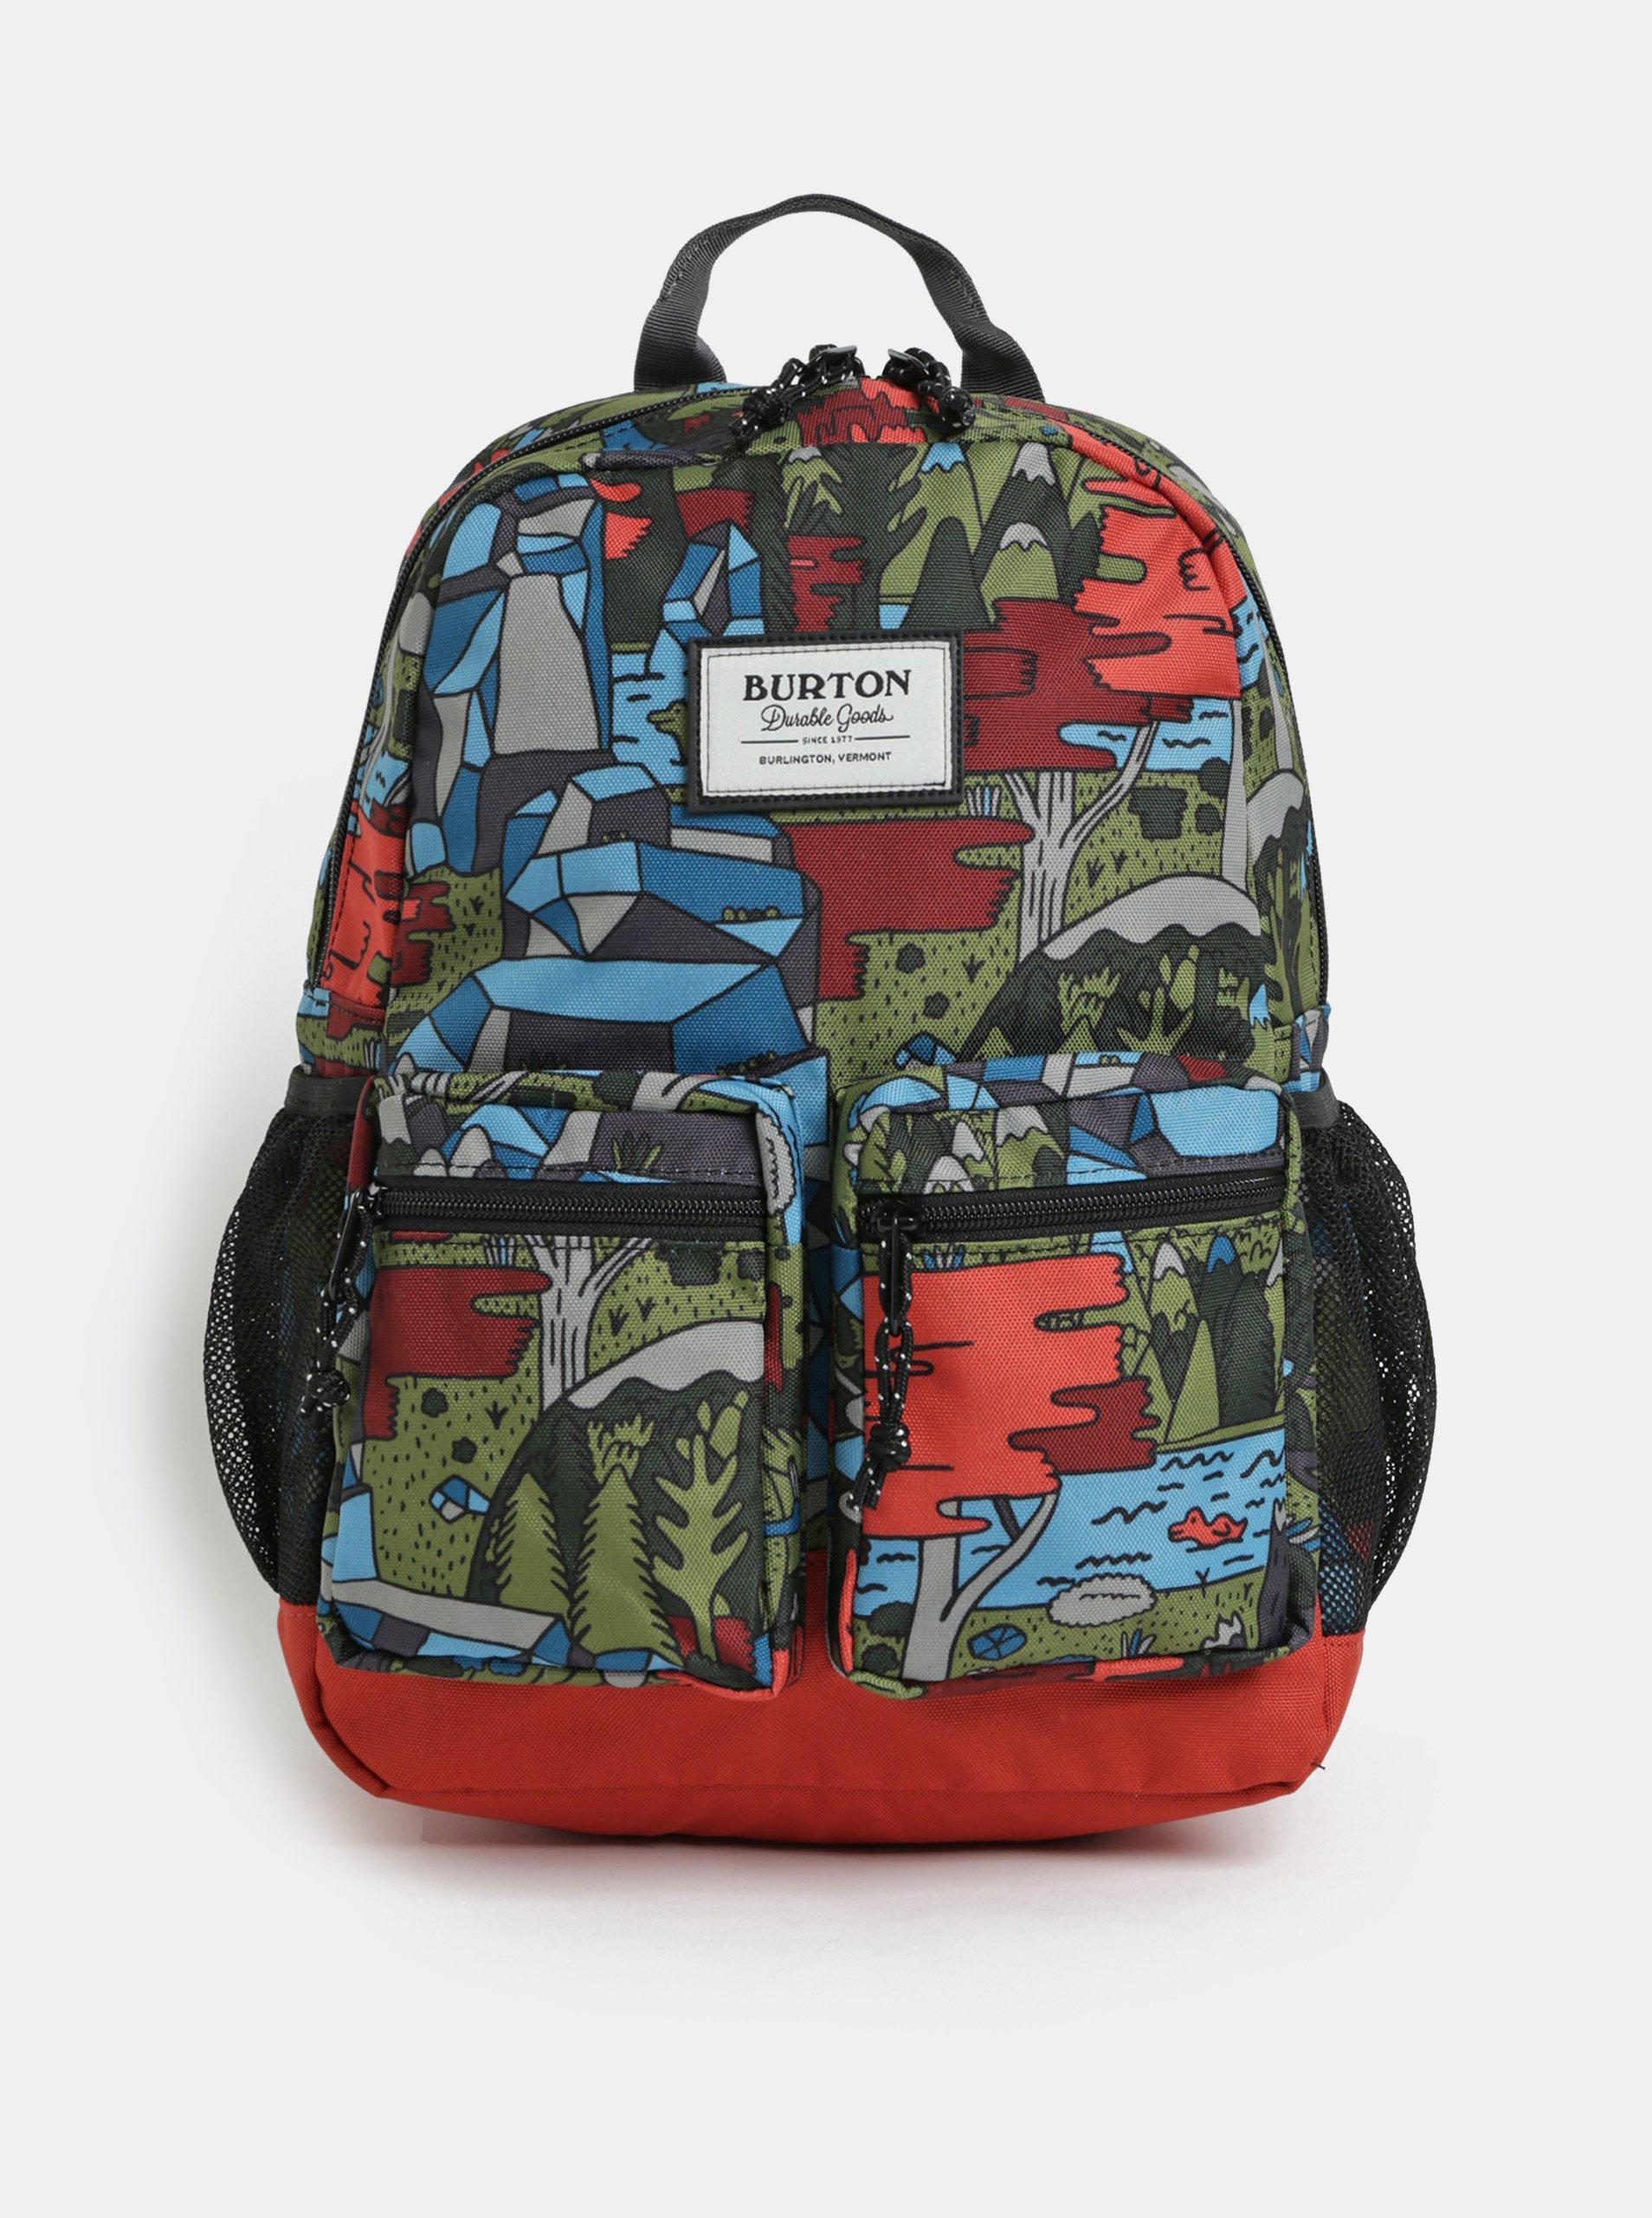 febbd5391fd Oranžovo-zelený klučičí batoh batoh Burton Gromlet 15 l